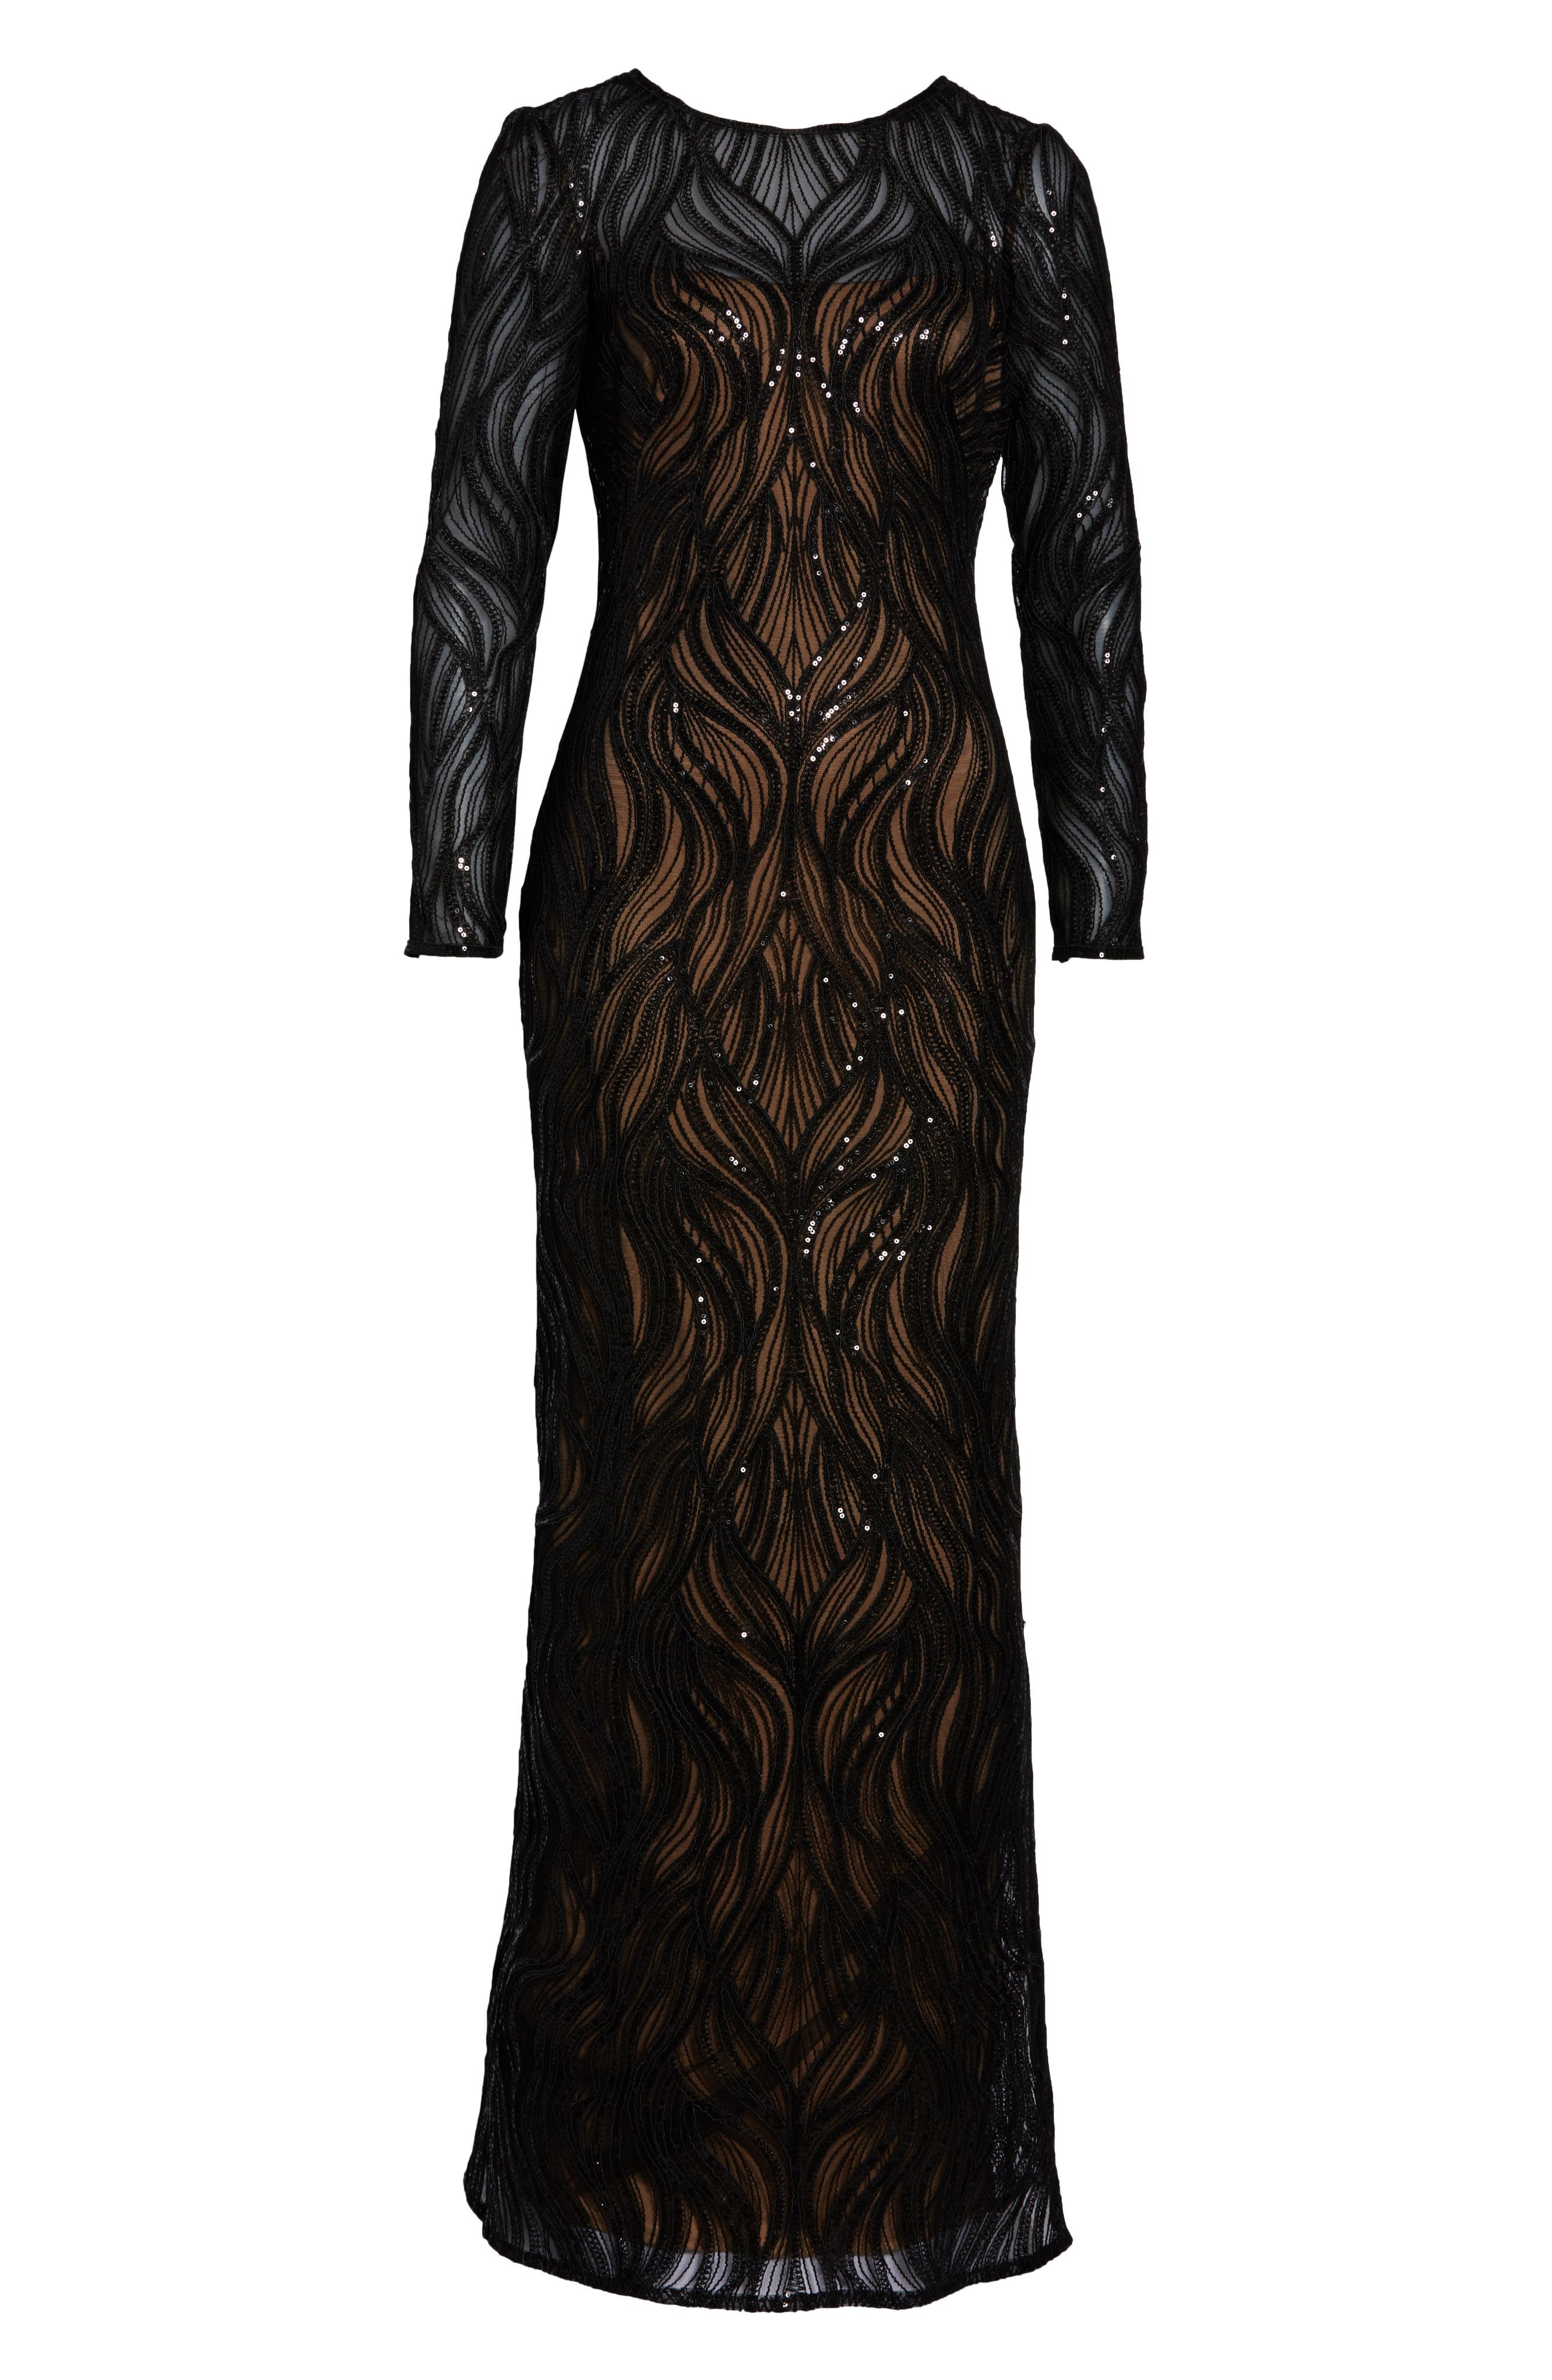 TADASHI SHOJI, Long Sleeve Sequined Mesh Evening Dress, Alternate thumbnail 7, color, 001